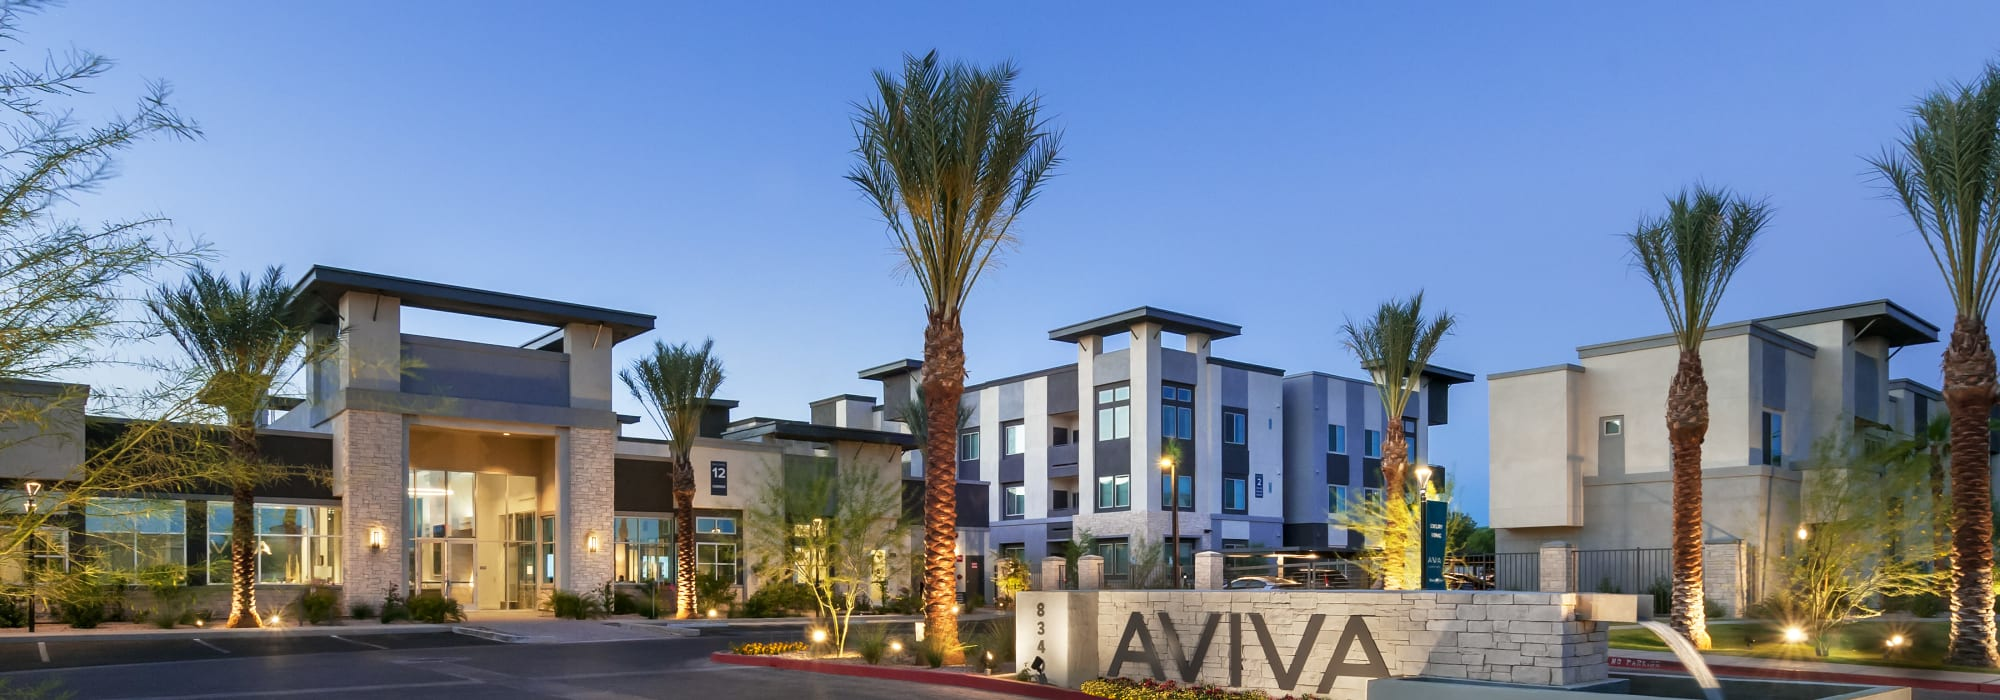 Entrance and front office at Aviva in Mesa, Arizona